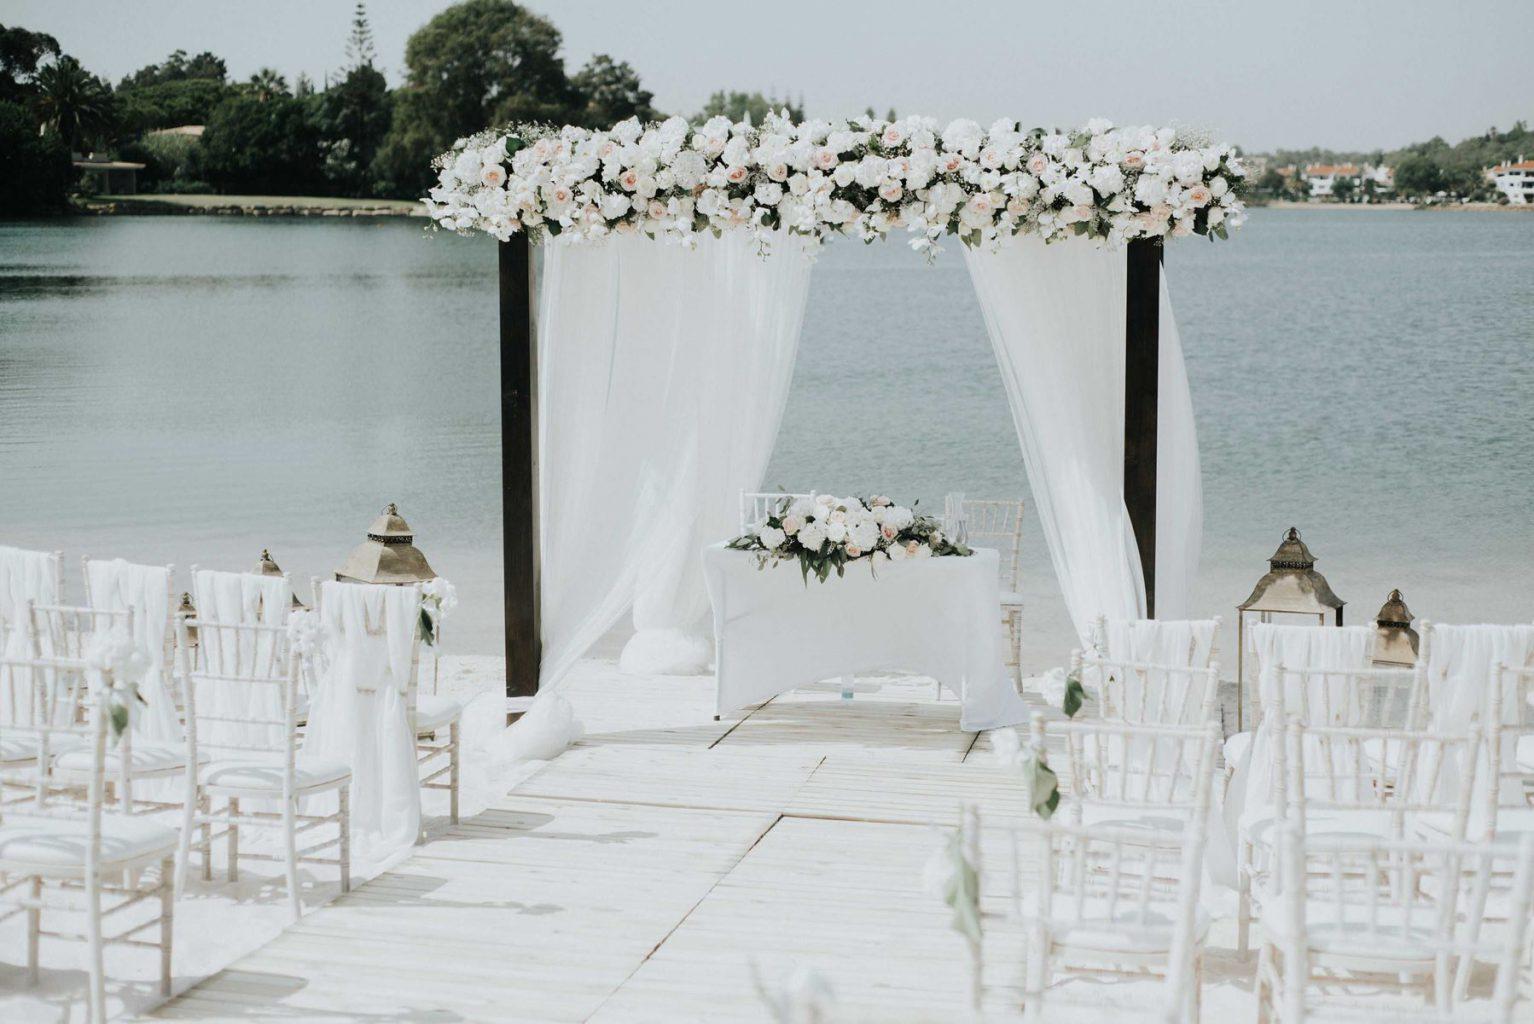 wedding chair hire algarve leather professor rebecca woodhall planner designer and coordinator weddings venue slider image by portugal